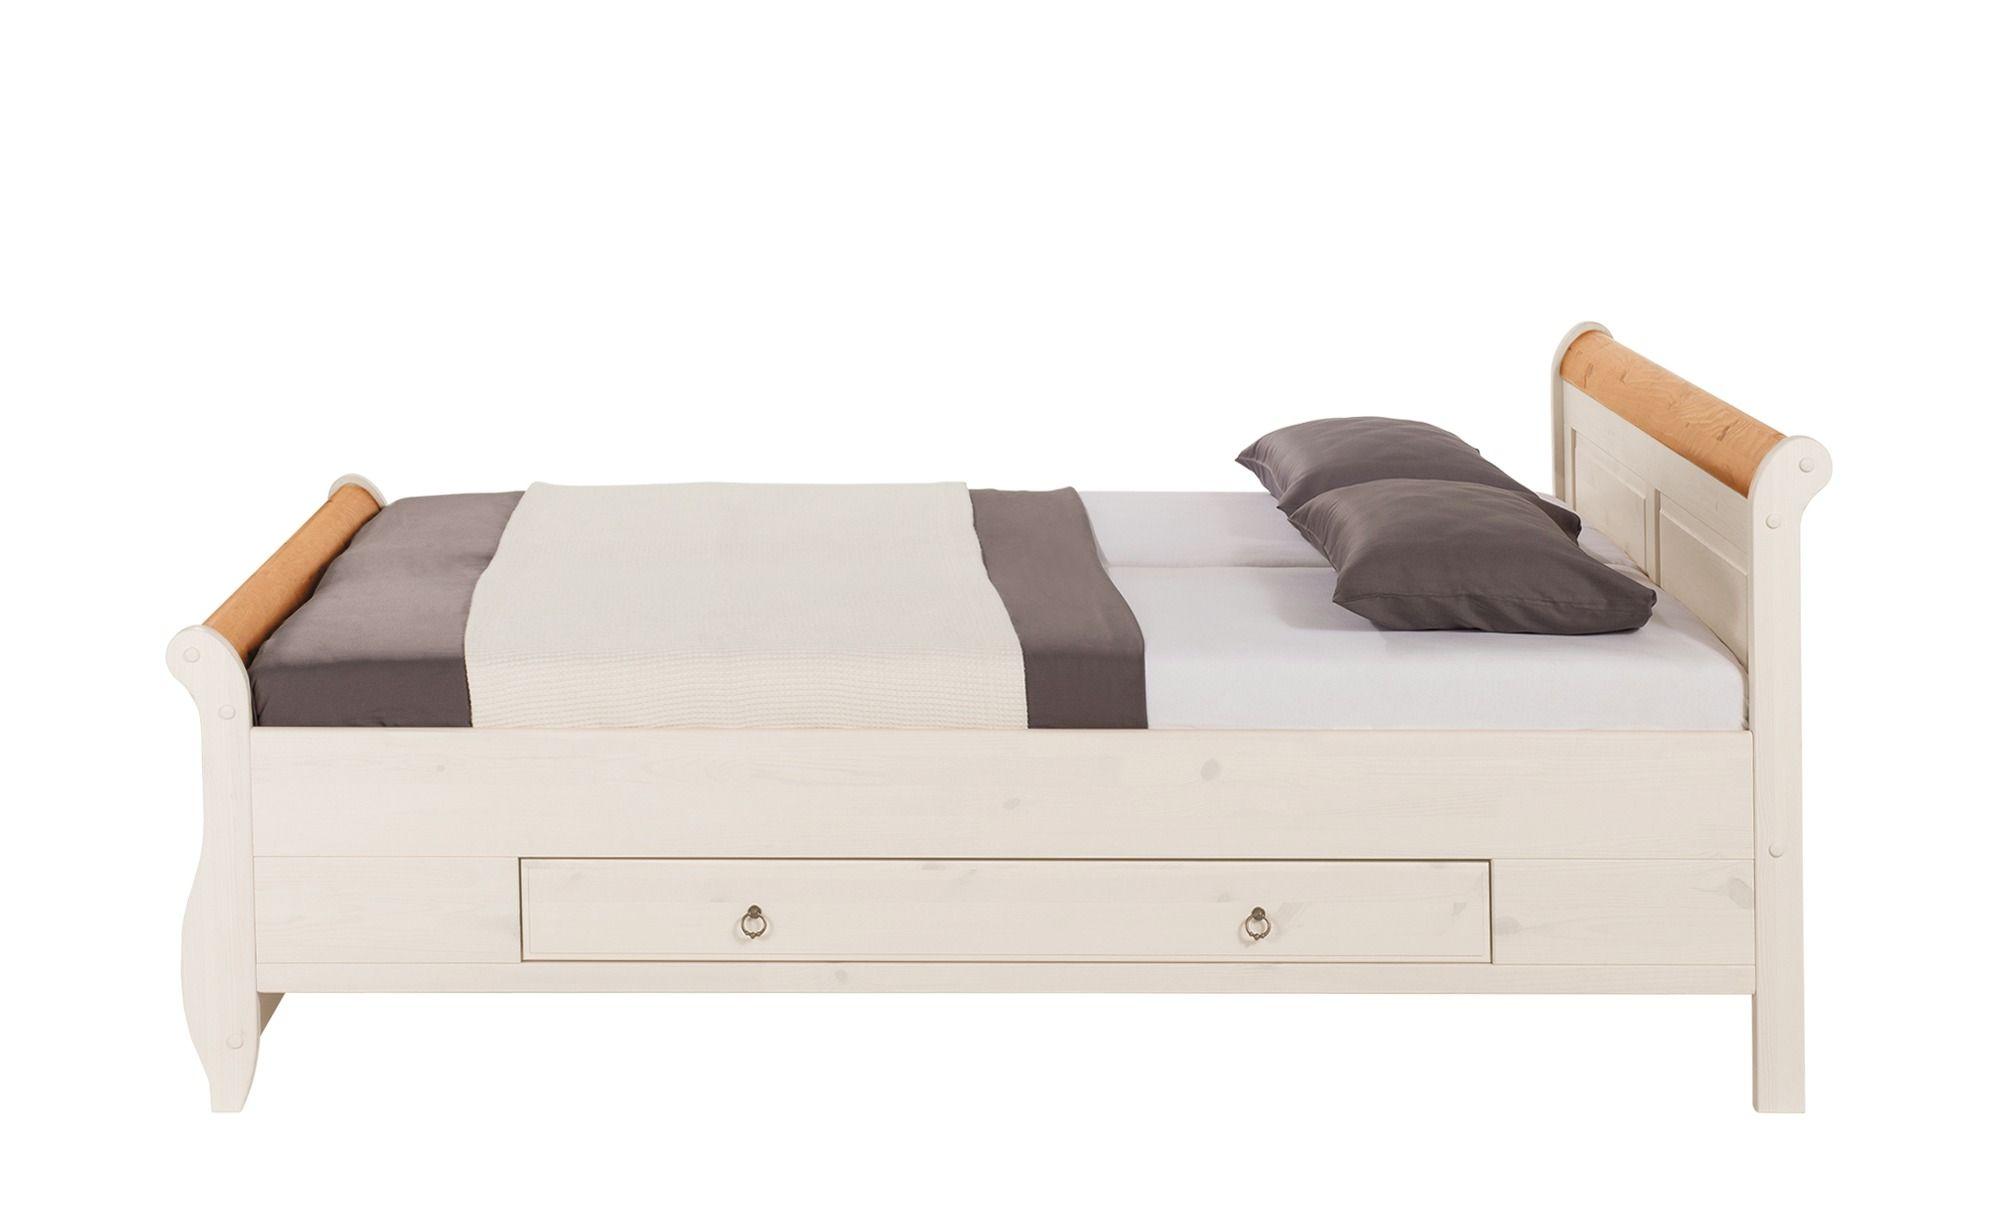 Bett Aus Der Serie Giselle In Weiss 140 X 200 Cm Home24 Bett Einzelbett Bett 140